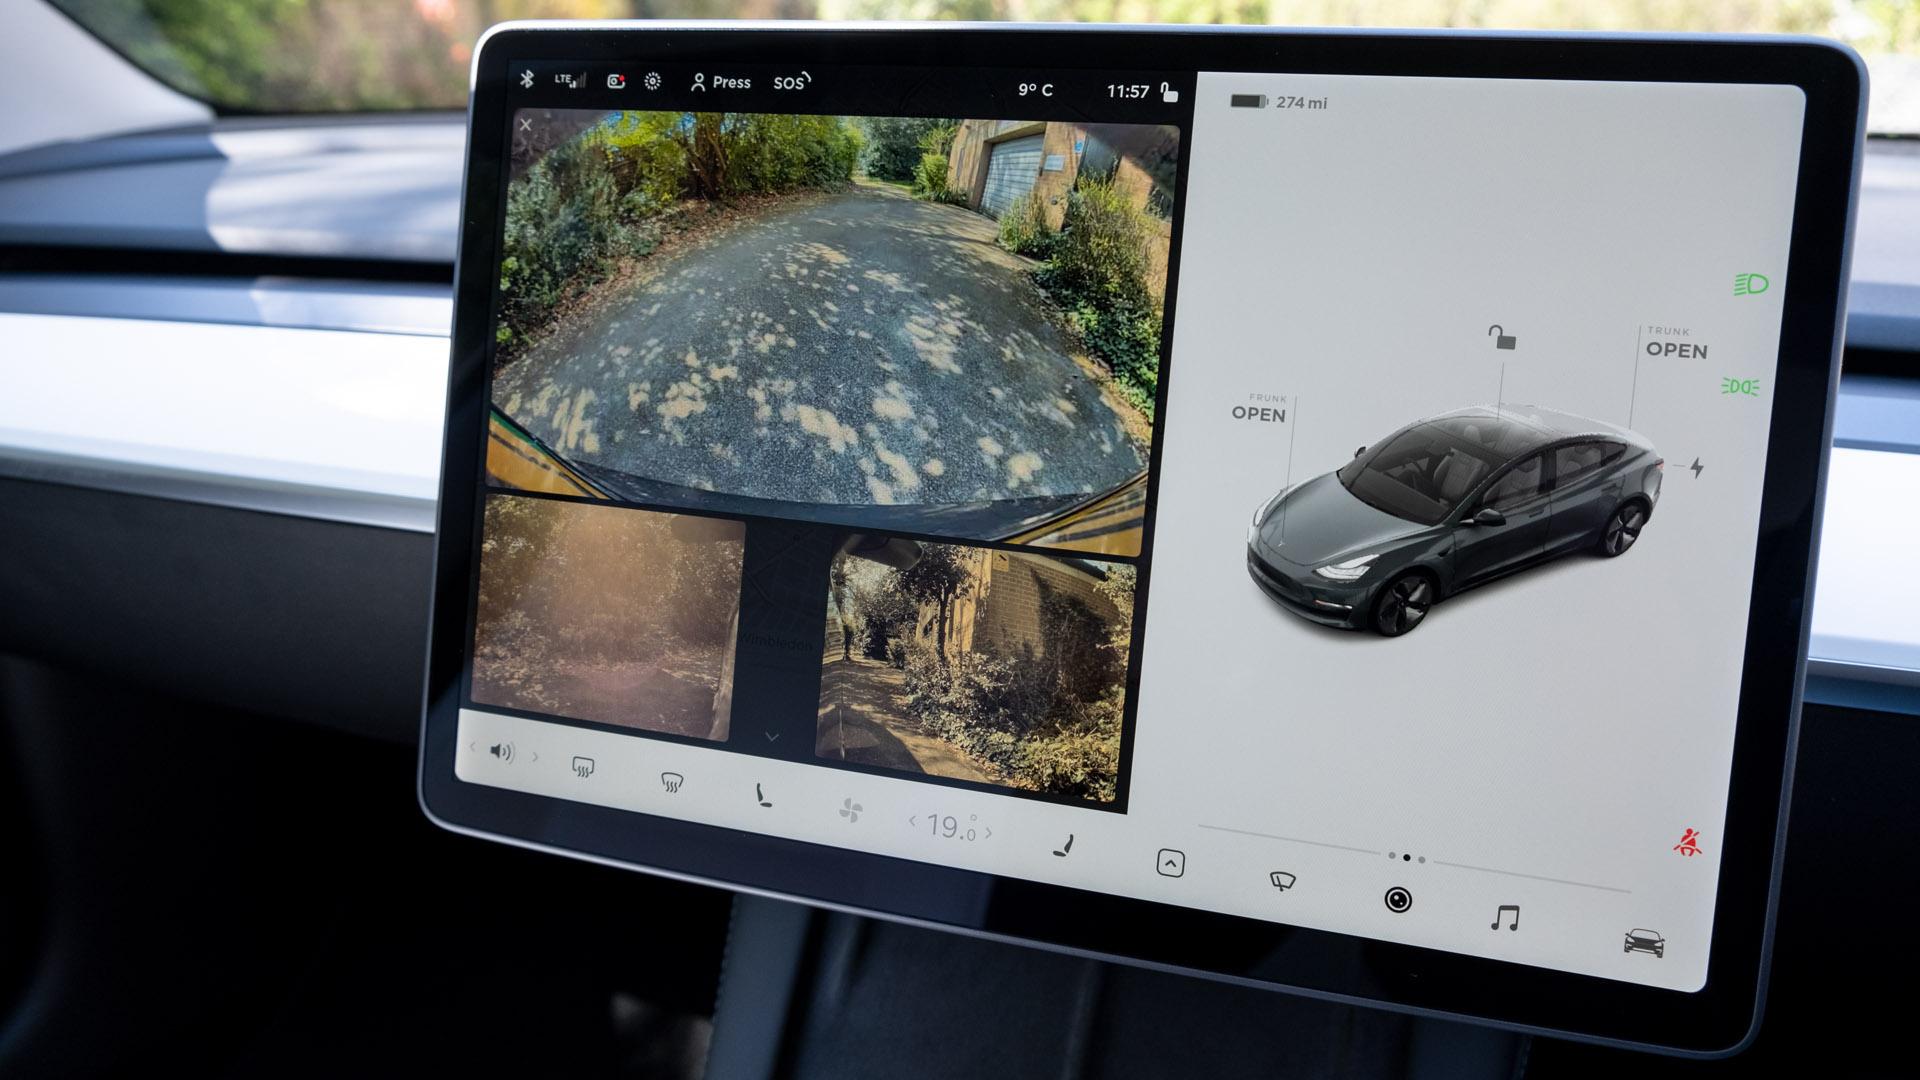 Tesla Model 3 cameras